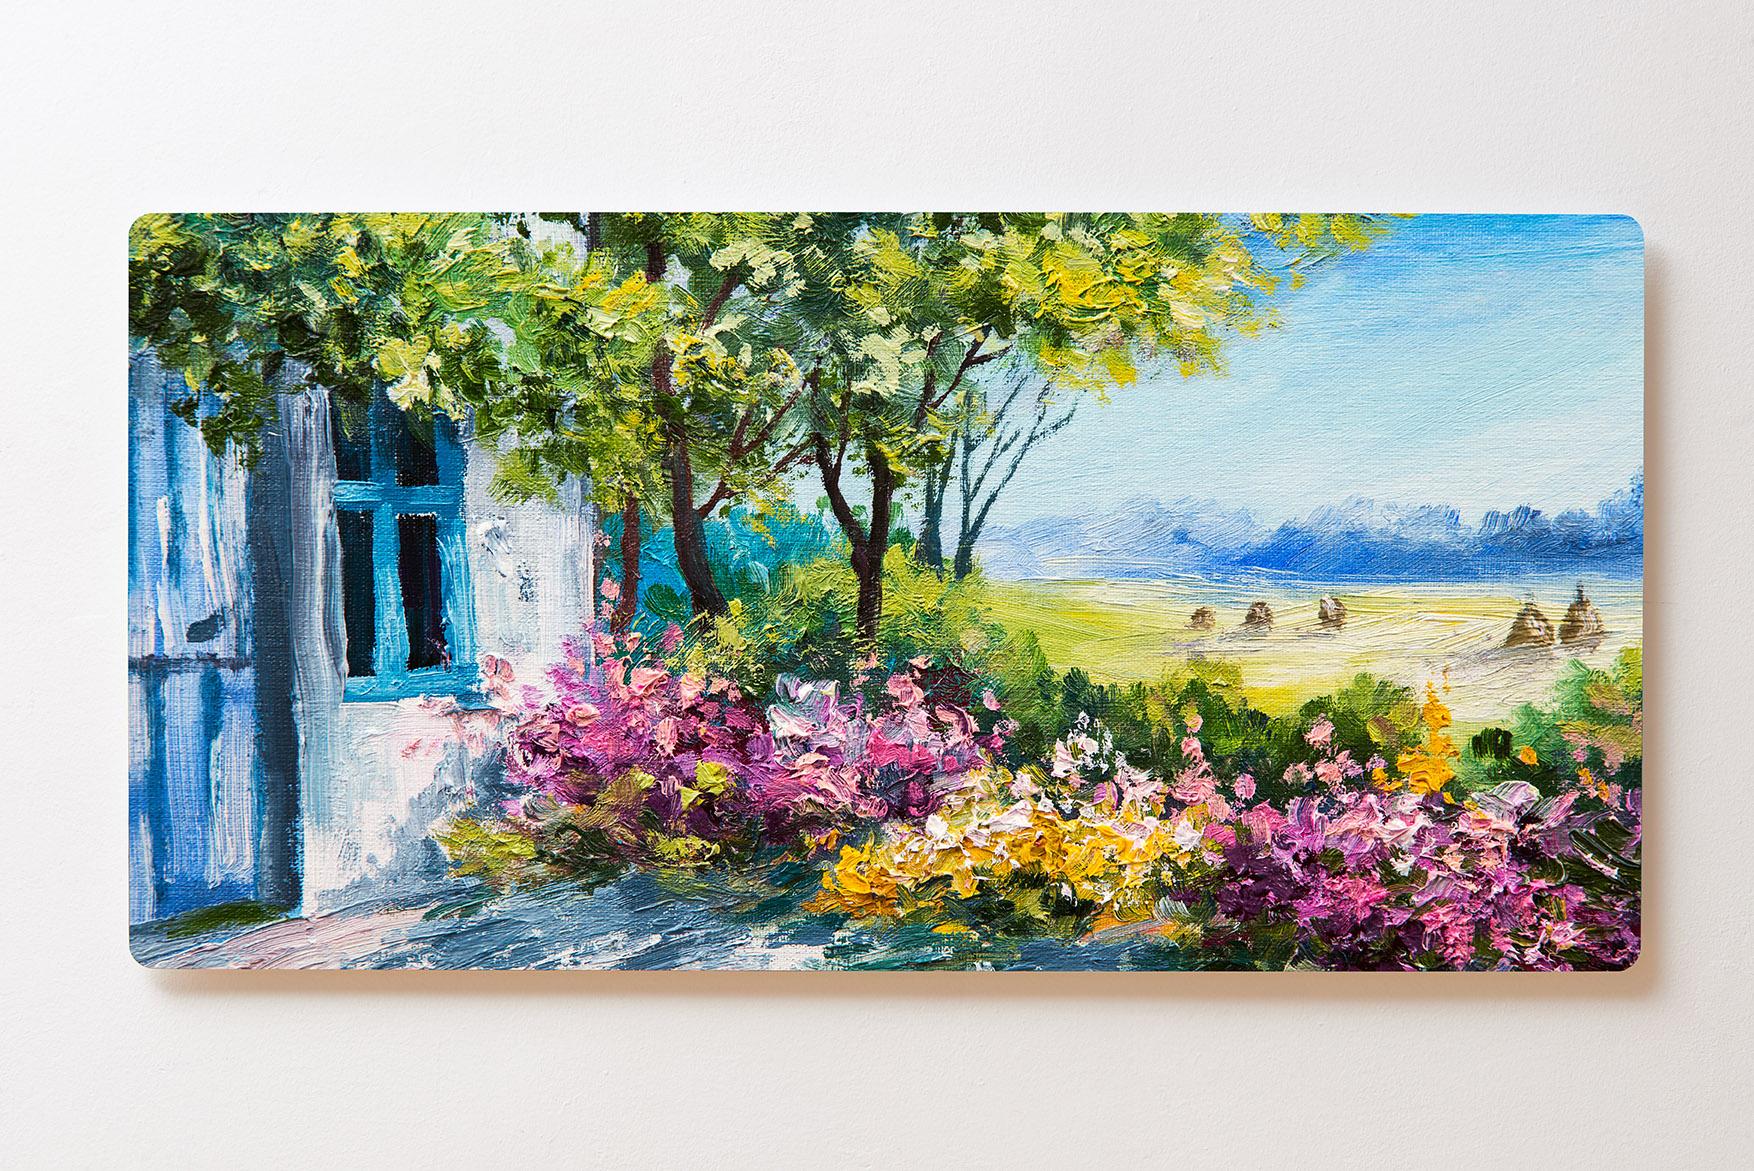 Magnettafel BACKLIGHT 120x60cm Motiv-Wandbild M117 Gemälde Landhaus